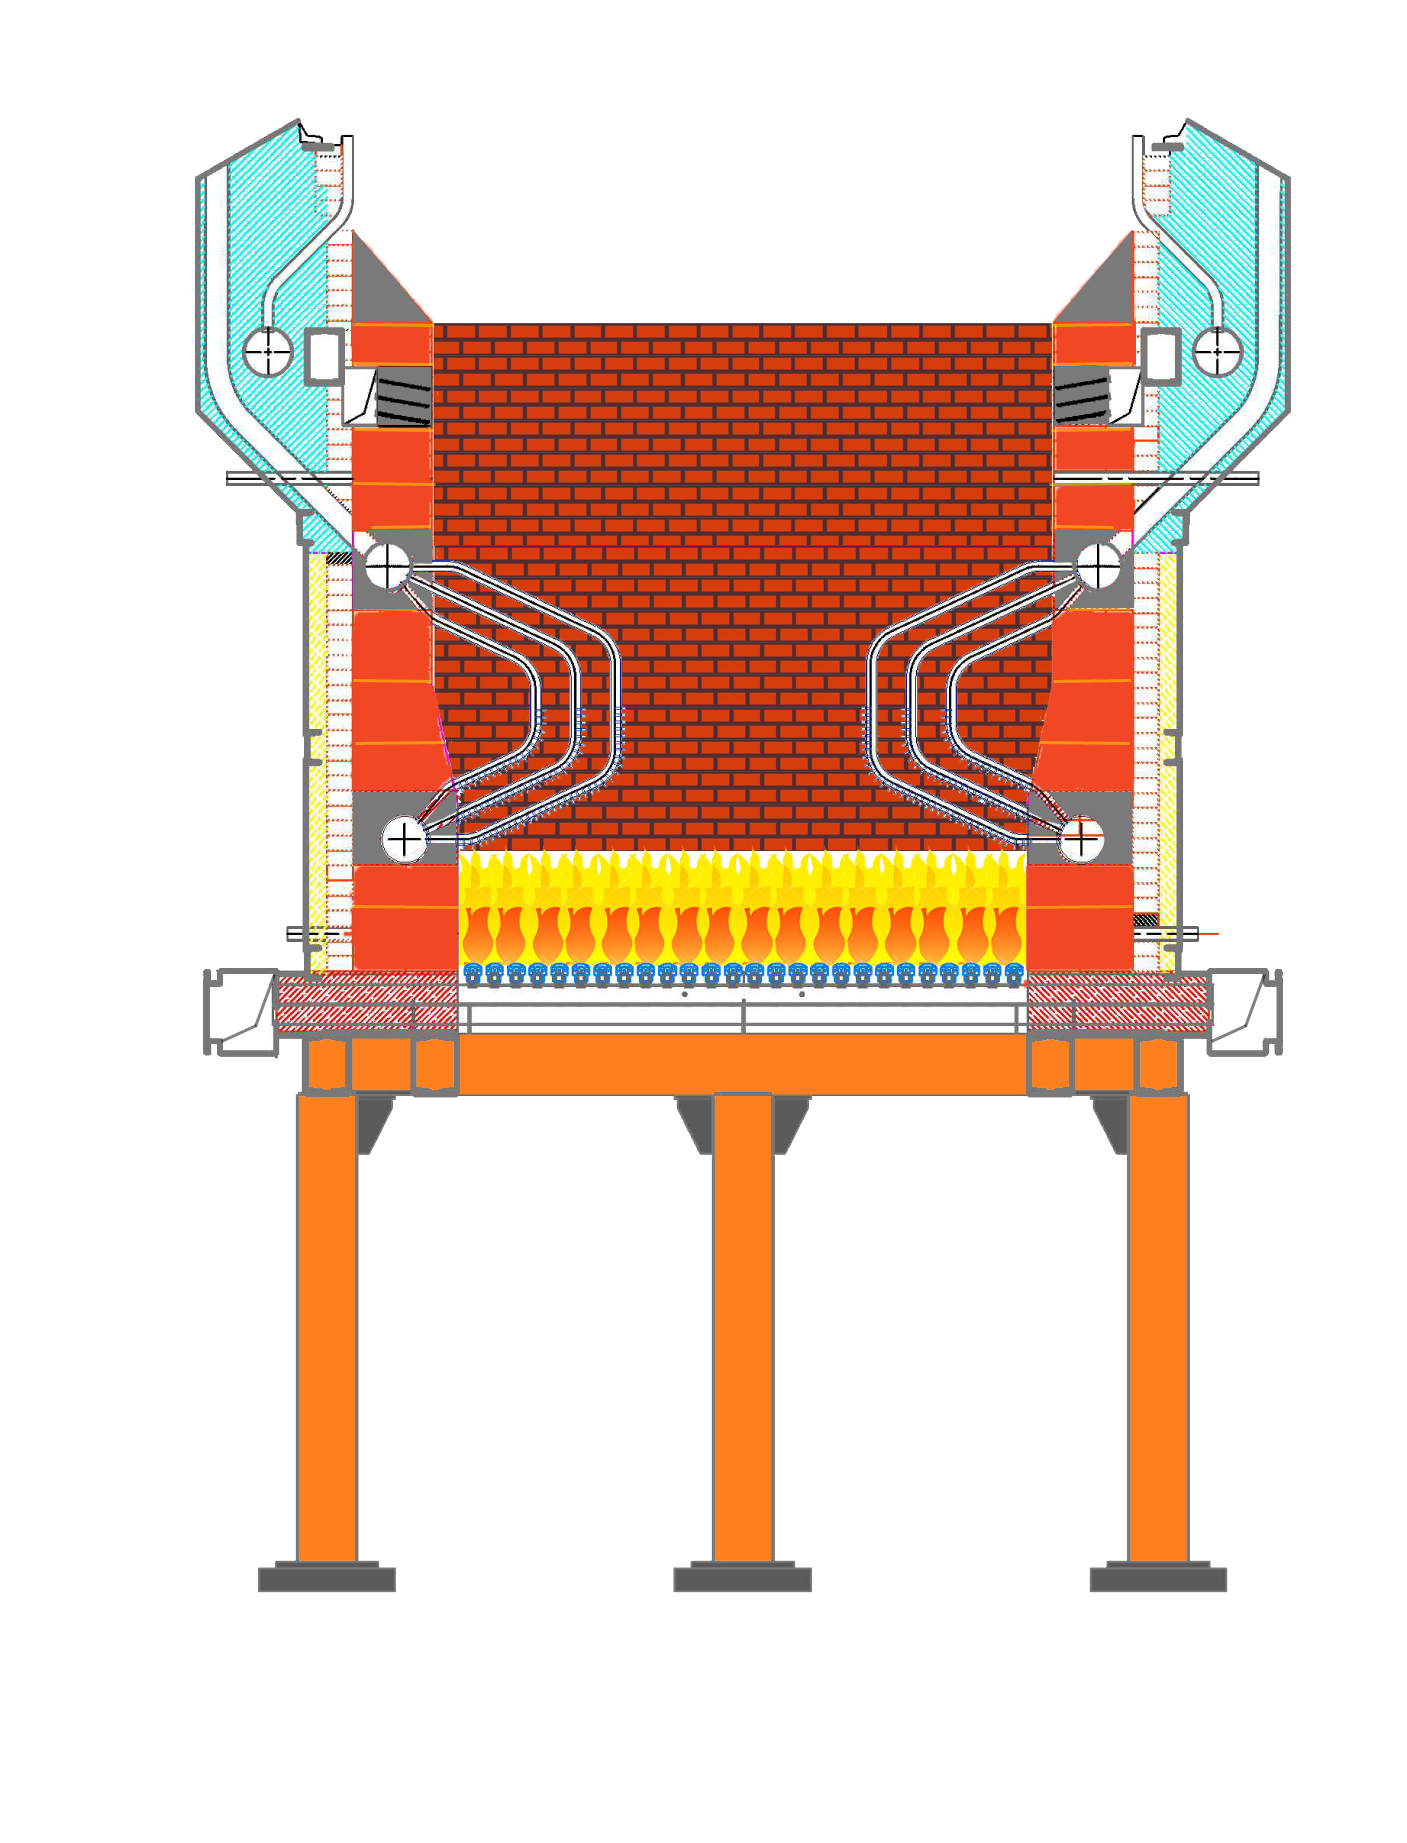 df30-fbc-tube-2-and-3-layers-comparison-2016